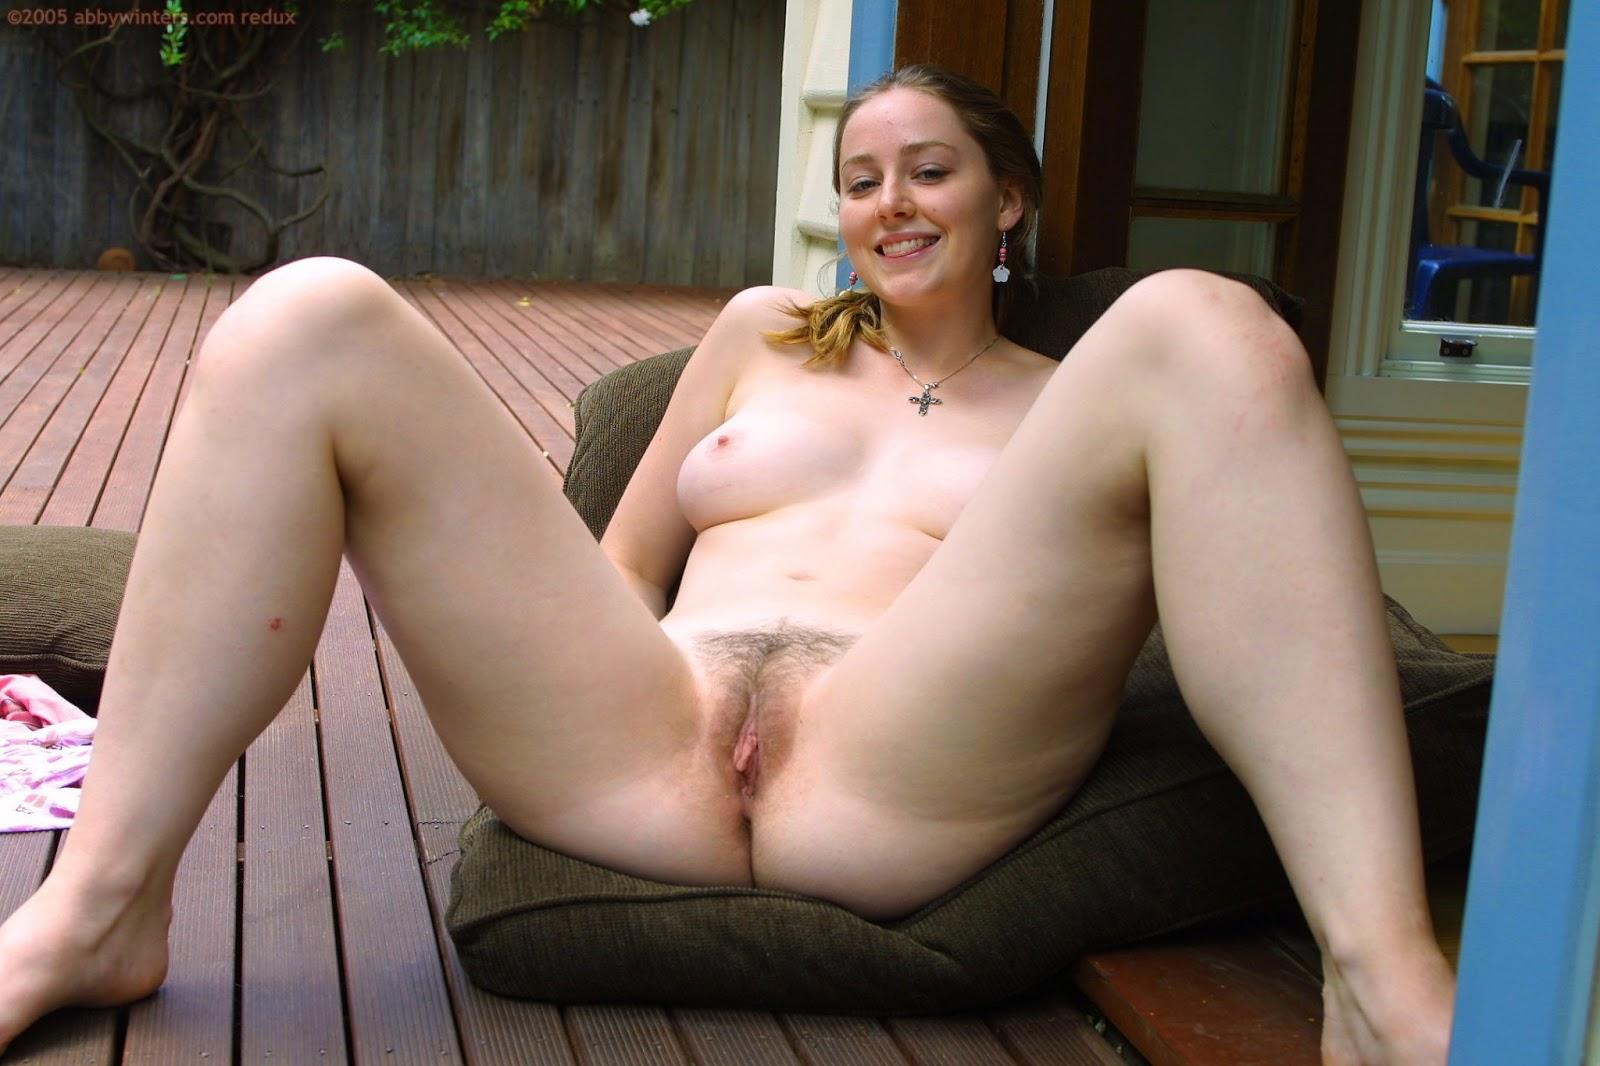 Sexy hot lesbians having sex